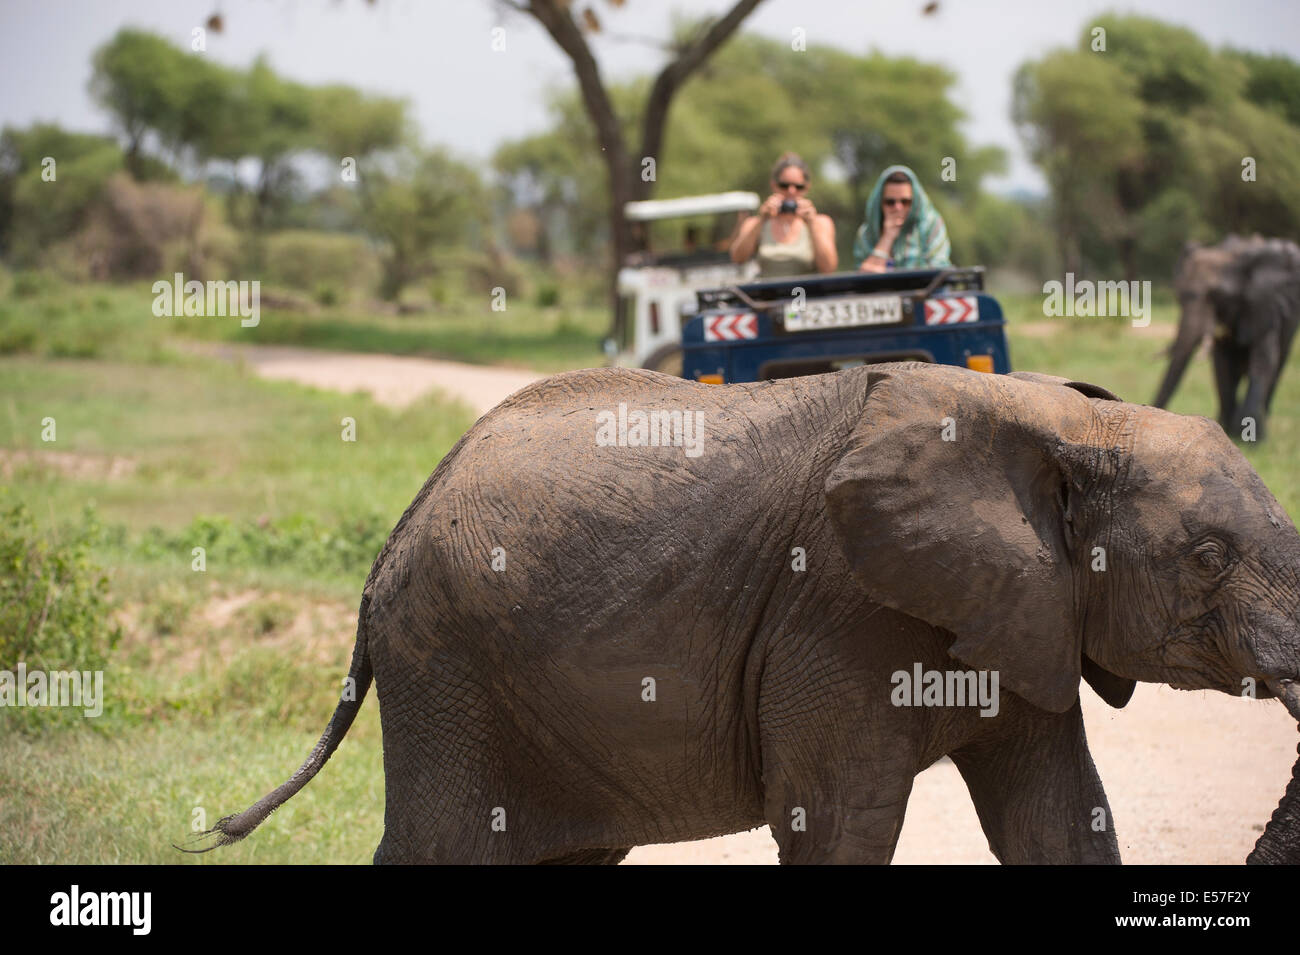 People watching an elephant in Tarangire national park Tanzania - Stock Image